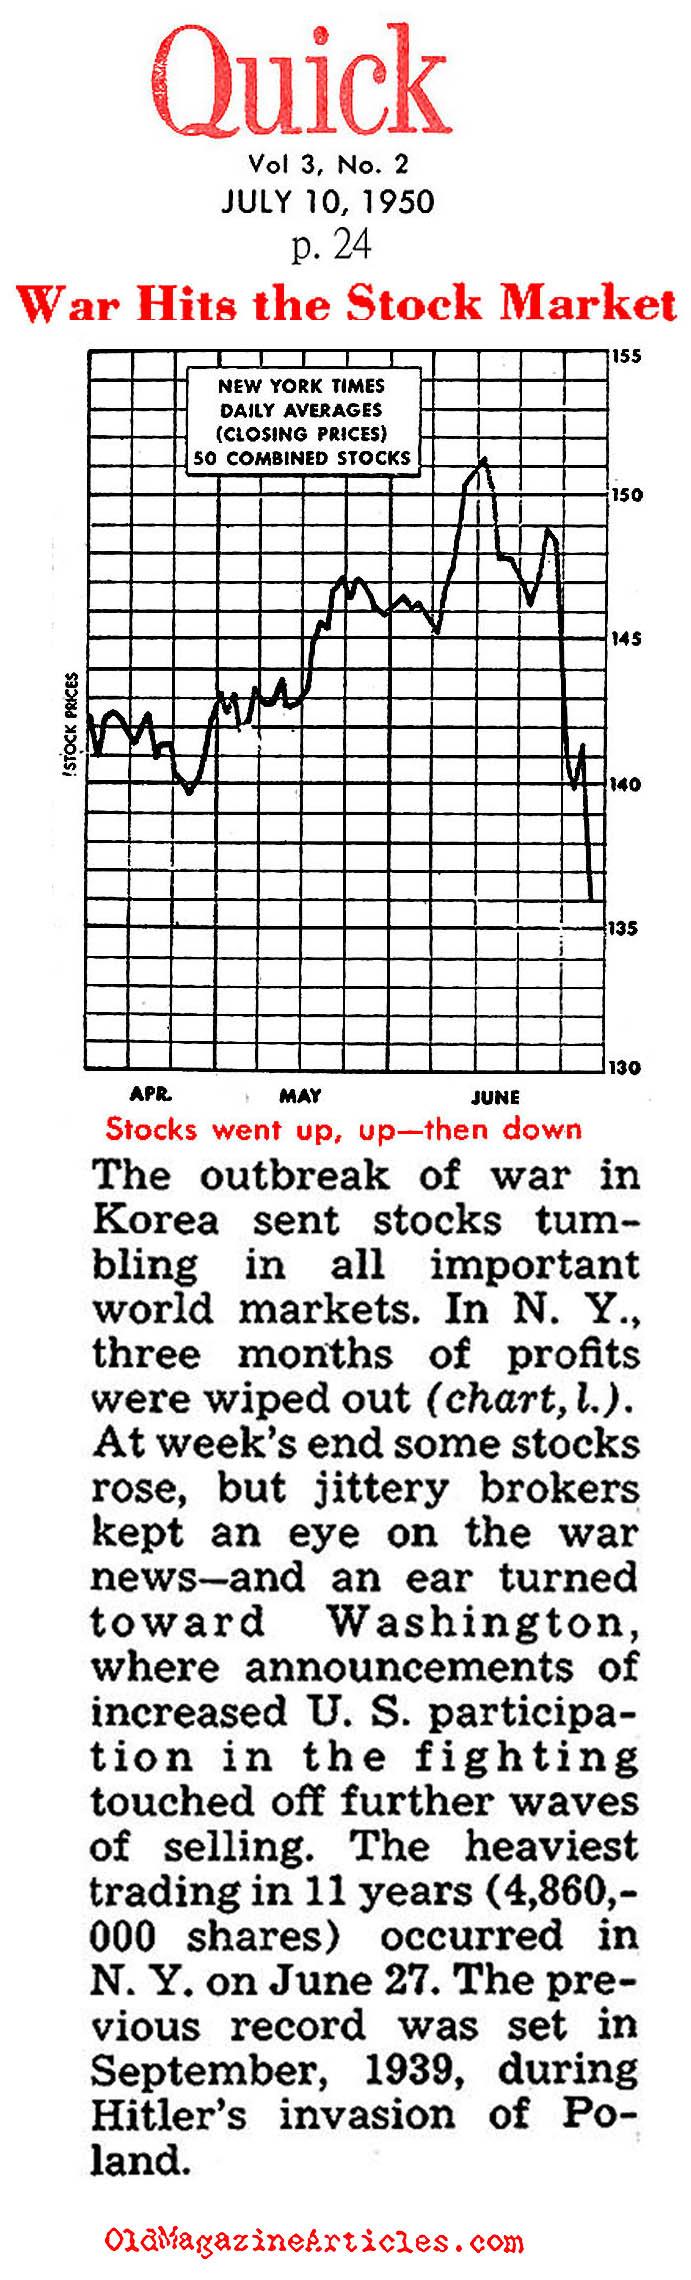 Stock Market Definition - Investopedia